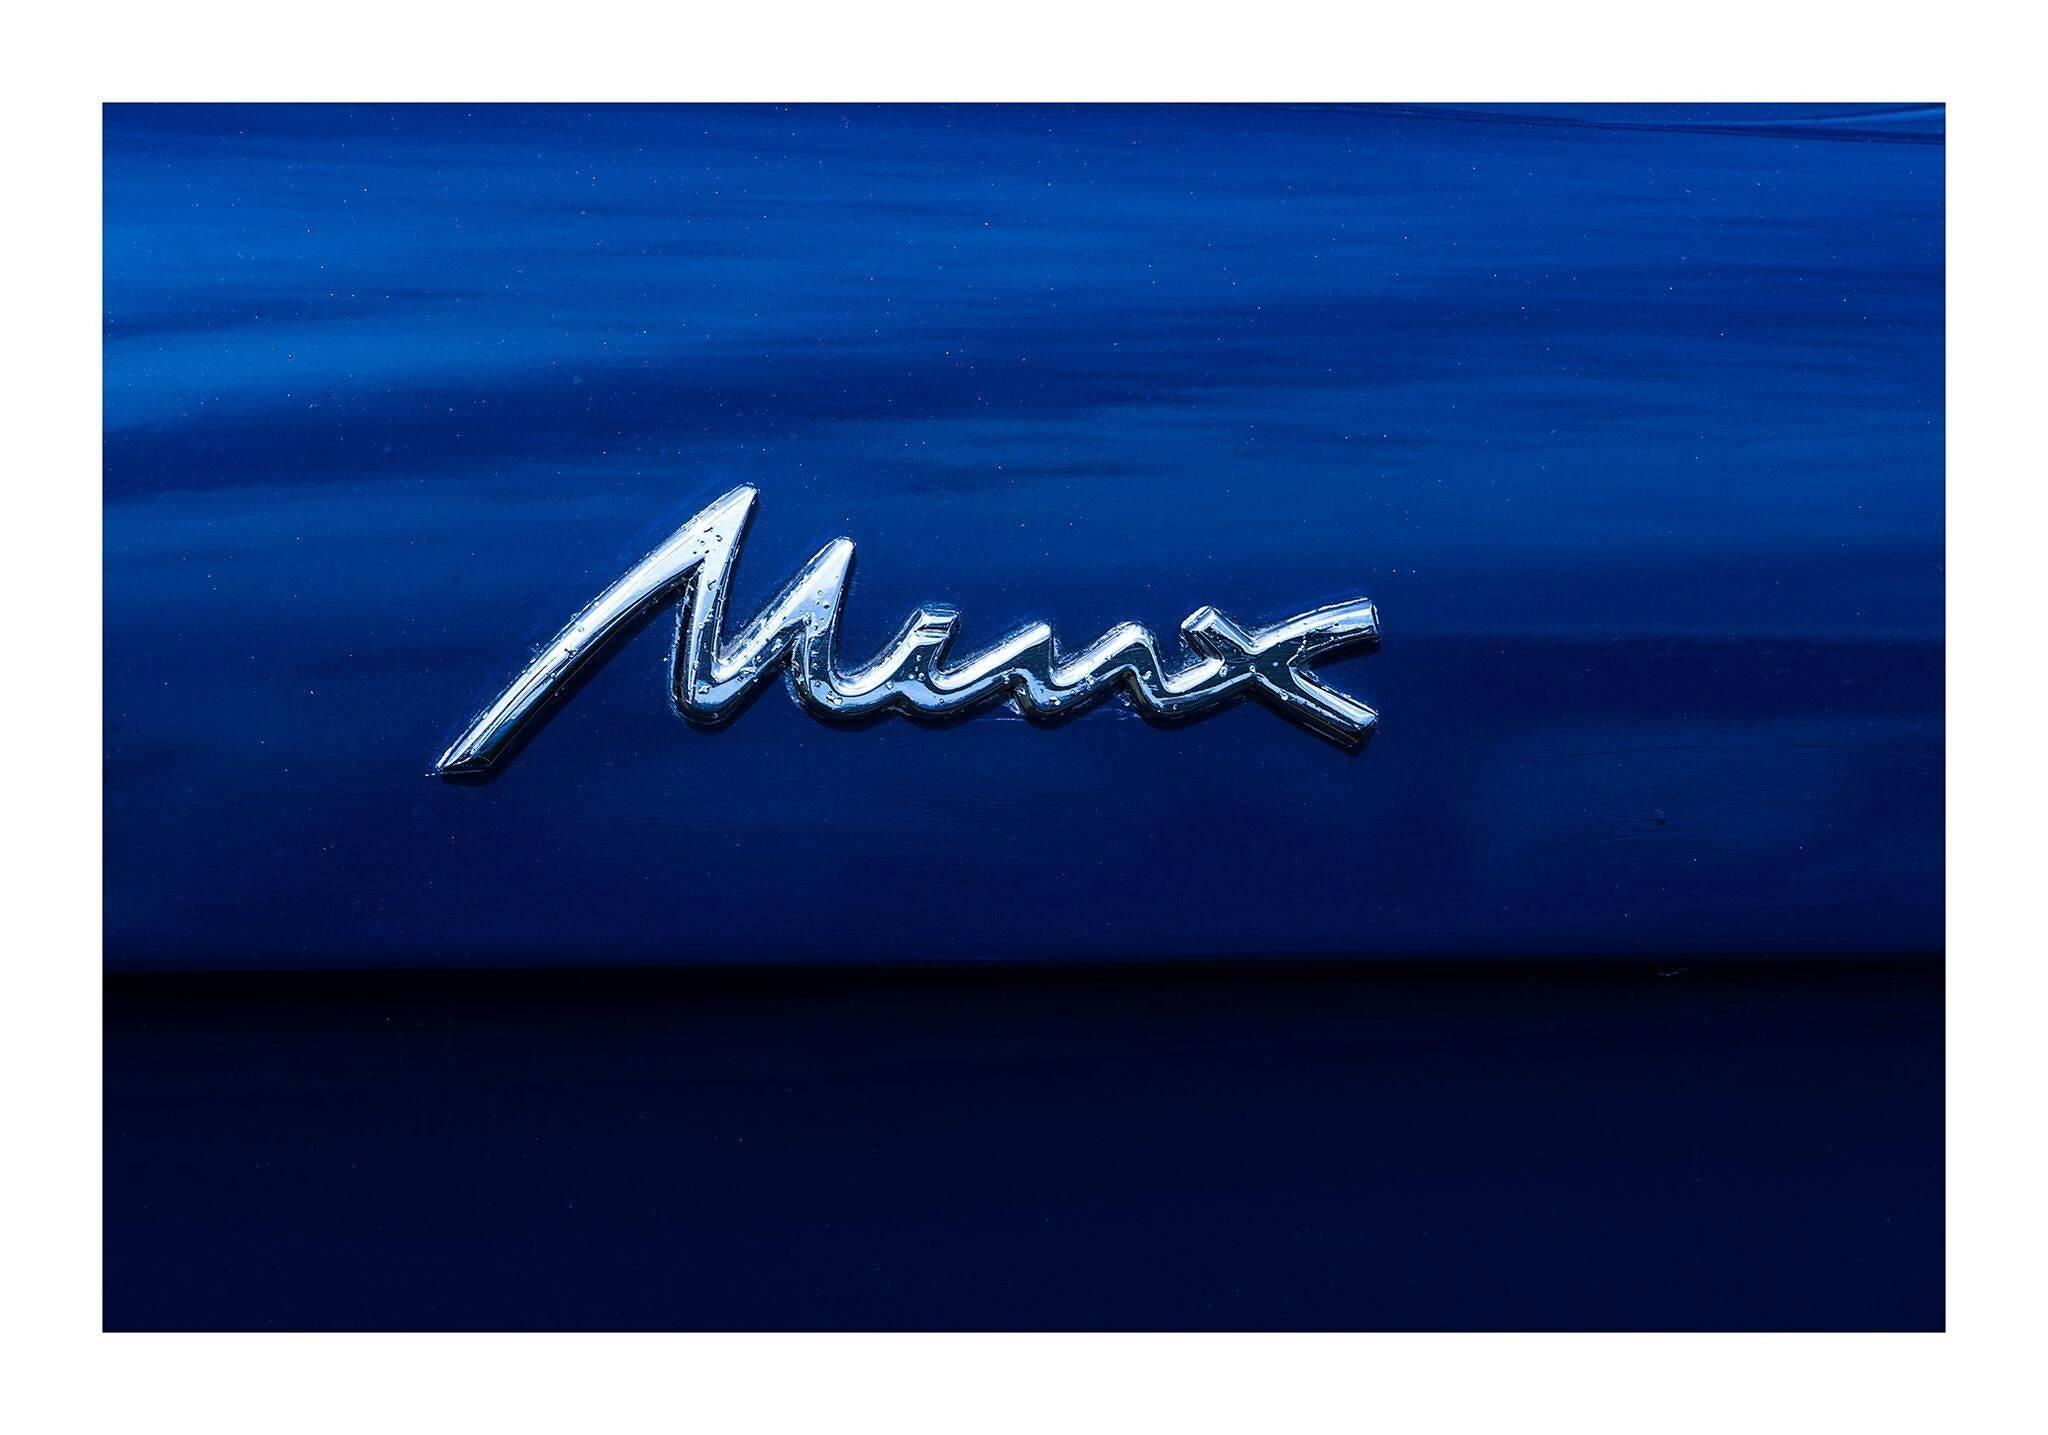 1960 Hillman Minx Series III Convertible - contemporary blue car lambda print